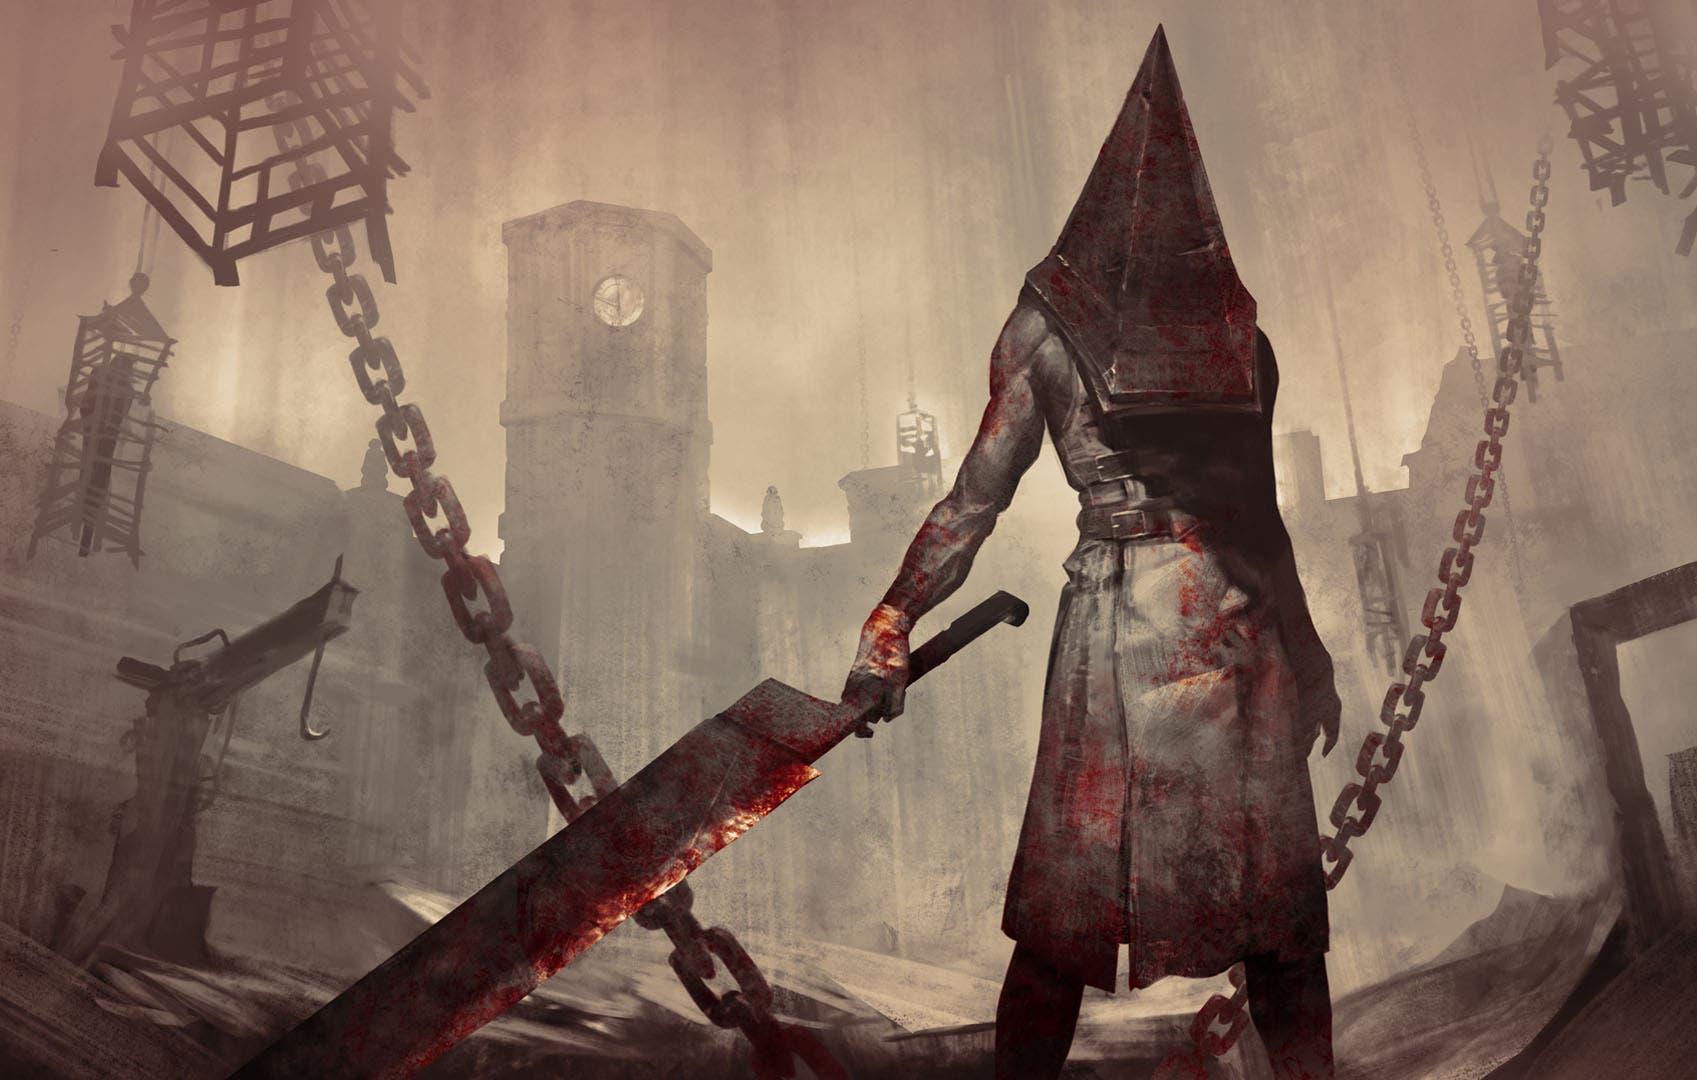 Así se fraguó el DLC de Silent Hill para Dead by Daylight 4